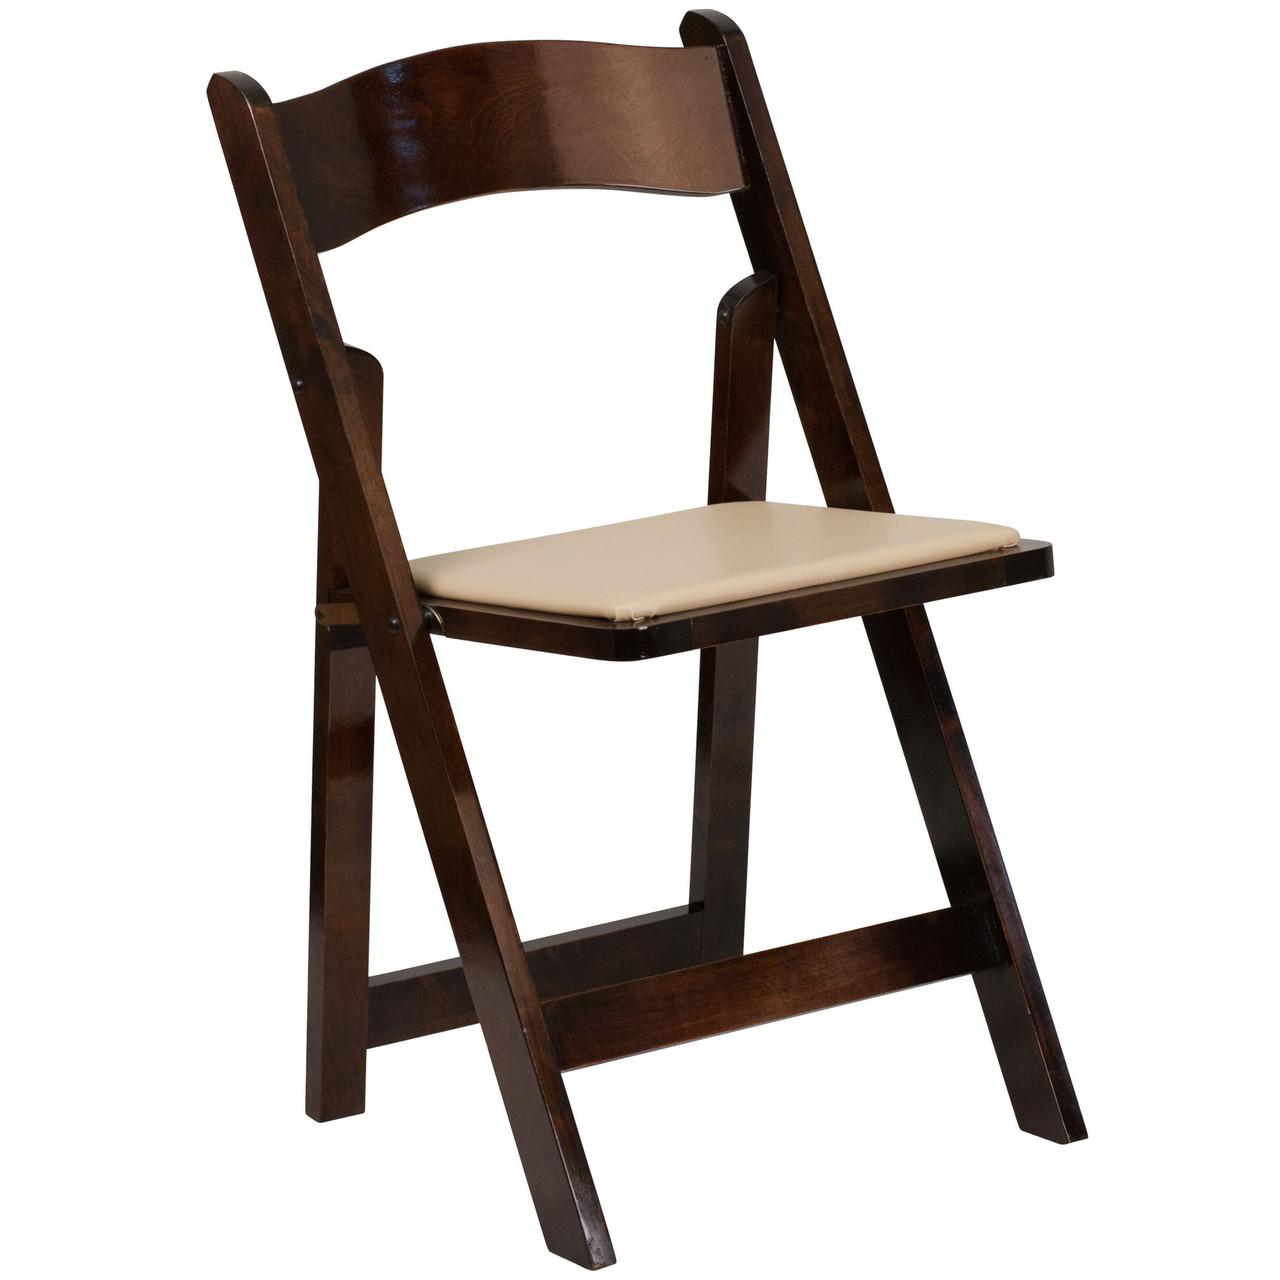 Tremendous Fruitwood Wood Folding Wedding Chairs Xf 2903 Fruit Wood Gg Bralicious Painted Fabric Chair Ideas Braliciousco